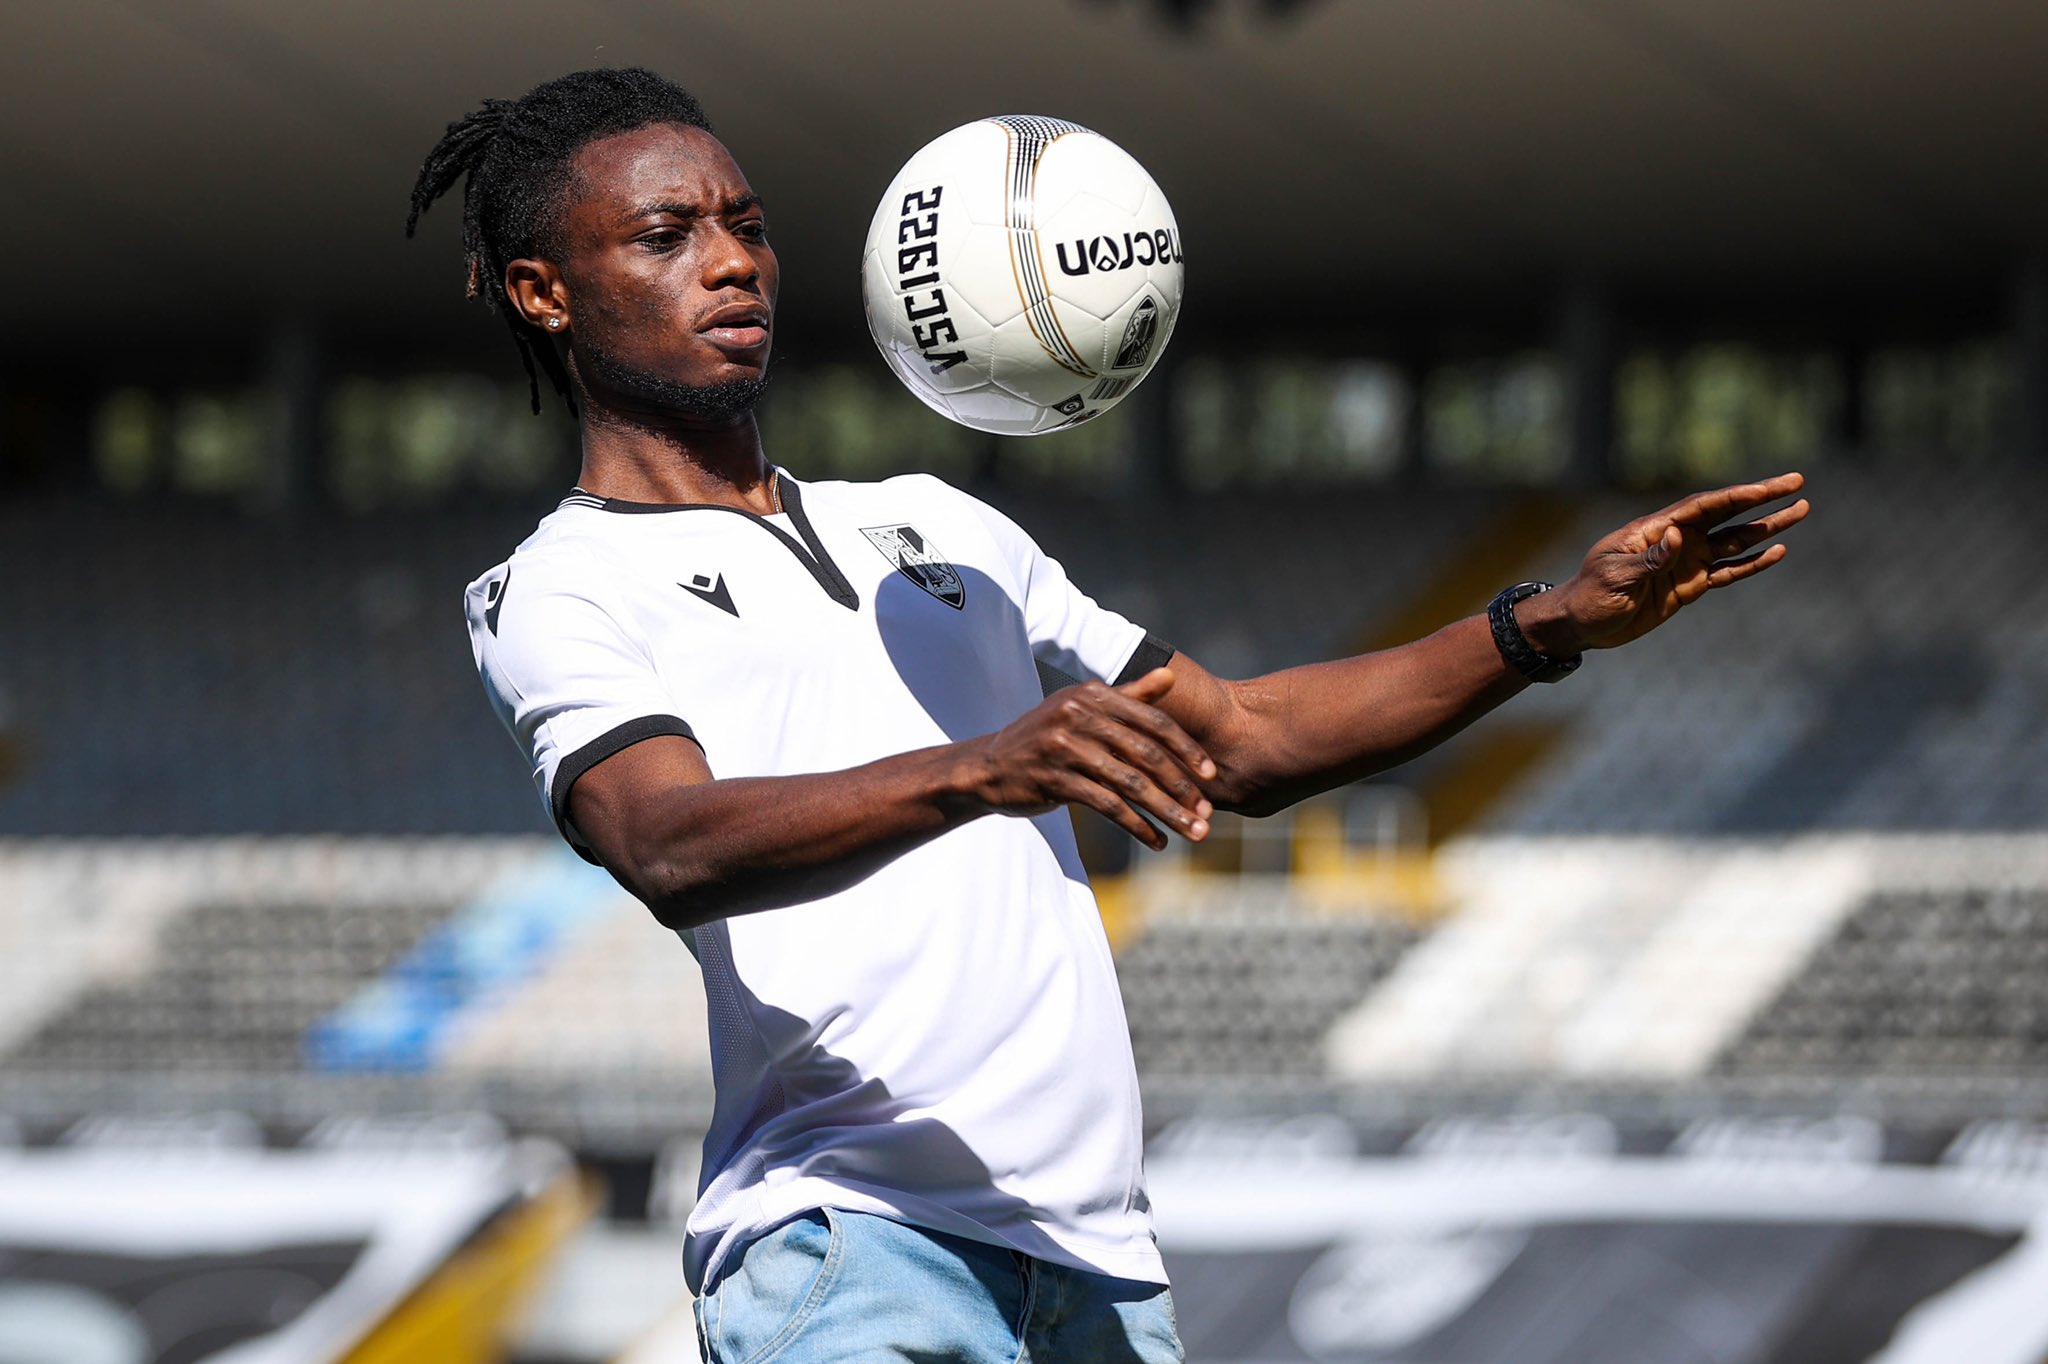 Exclusive: Ghana defender Gideon Mensah to leave Vitoria Guimaraes at the end of the season